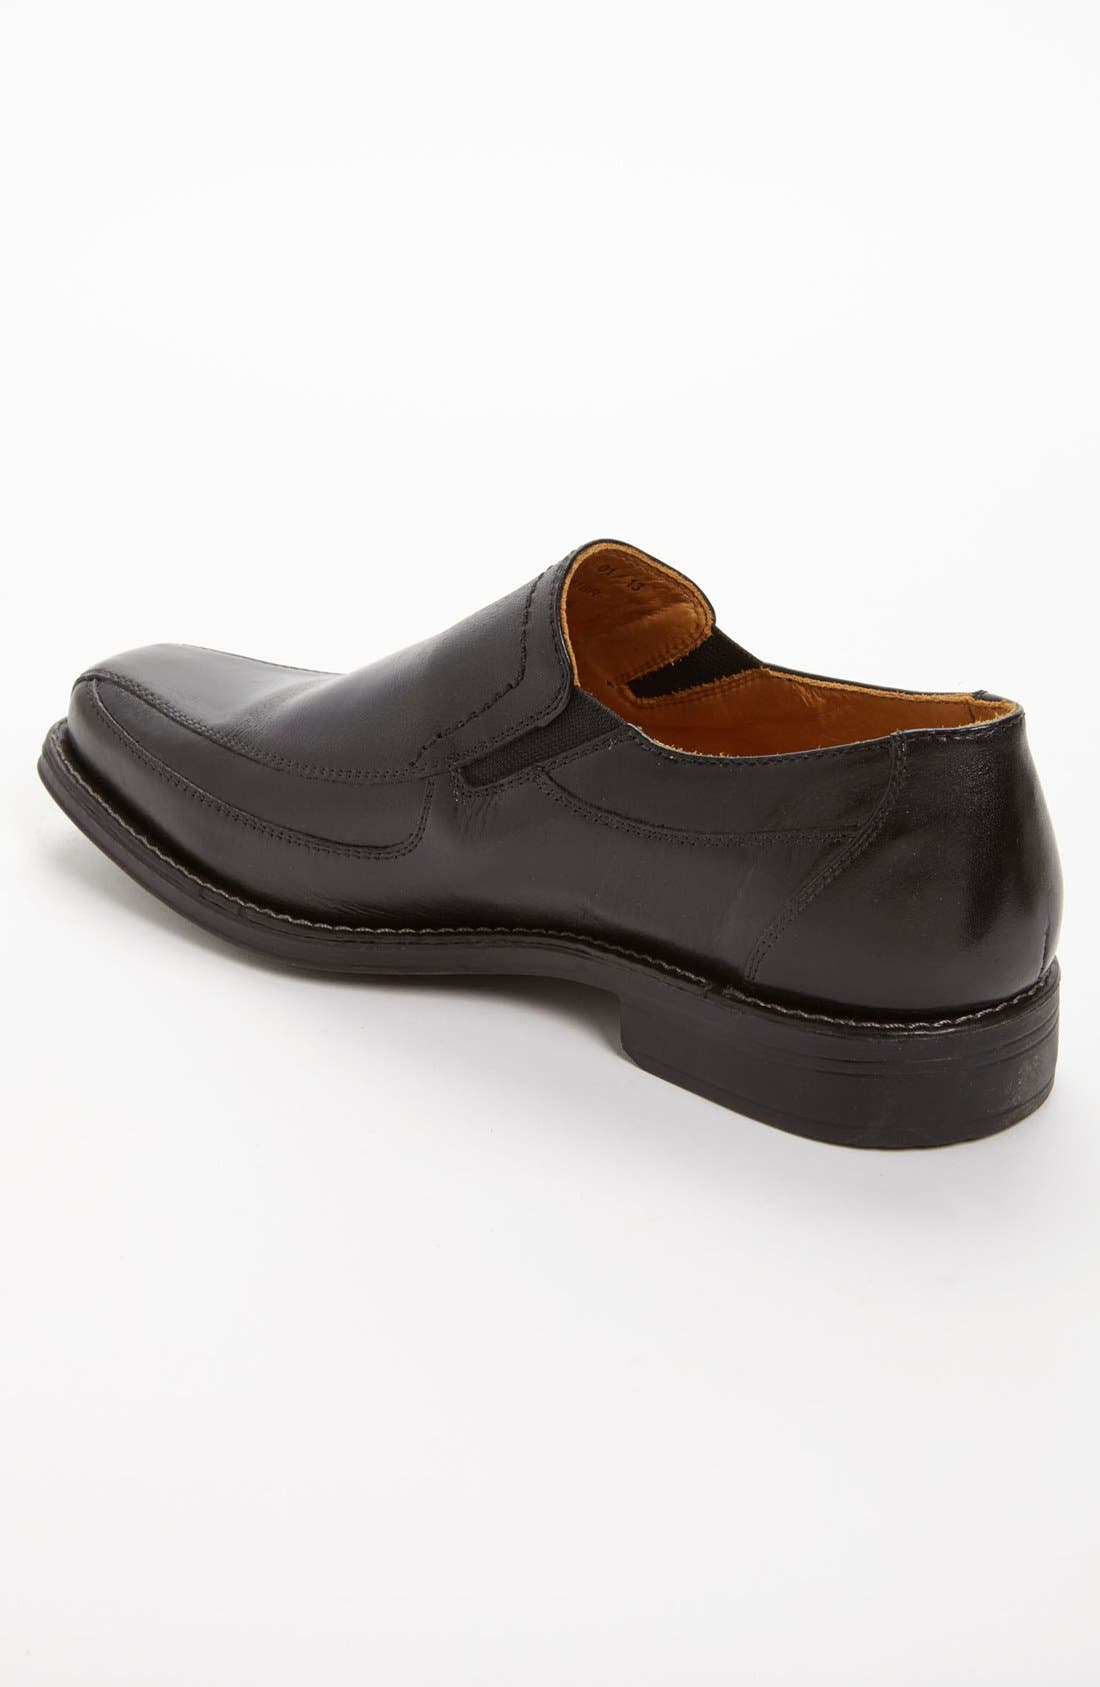 'Berwyn' Venetian Loafer,                             Alternate thumbnail 2, color,                             BLACK